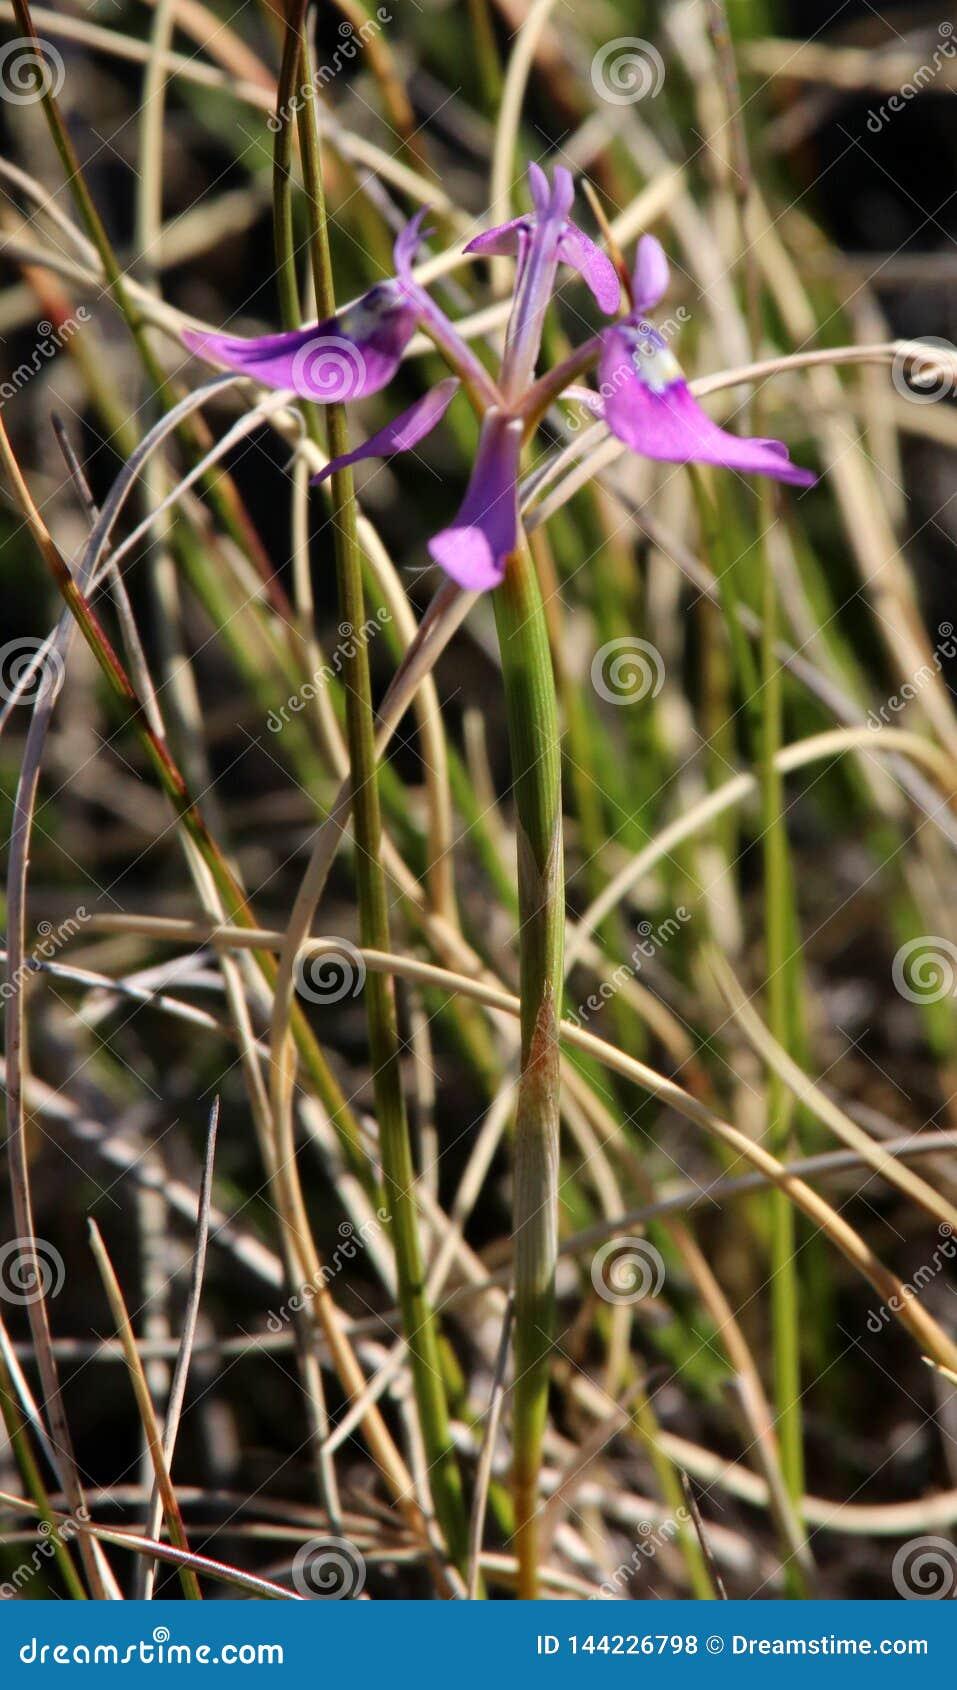 Primer de la flor salvaje púrpura del iris con follaje verde en fondo